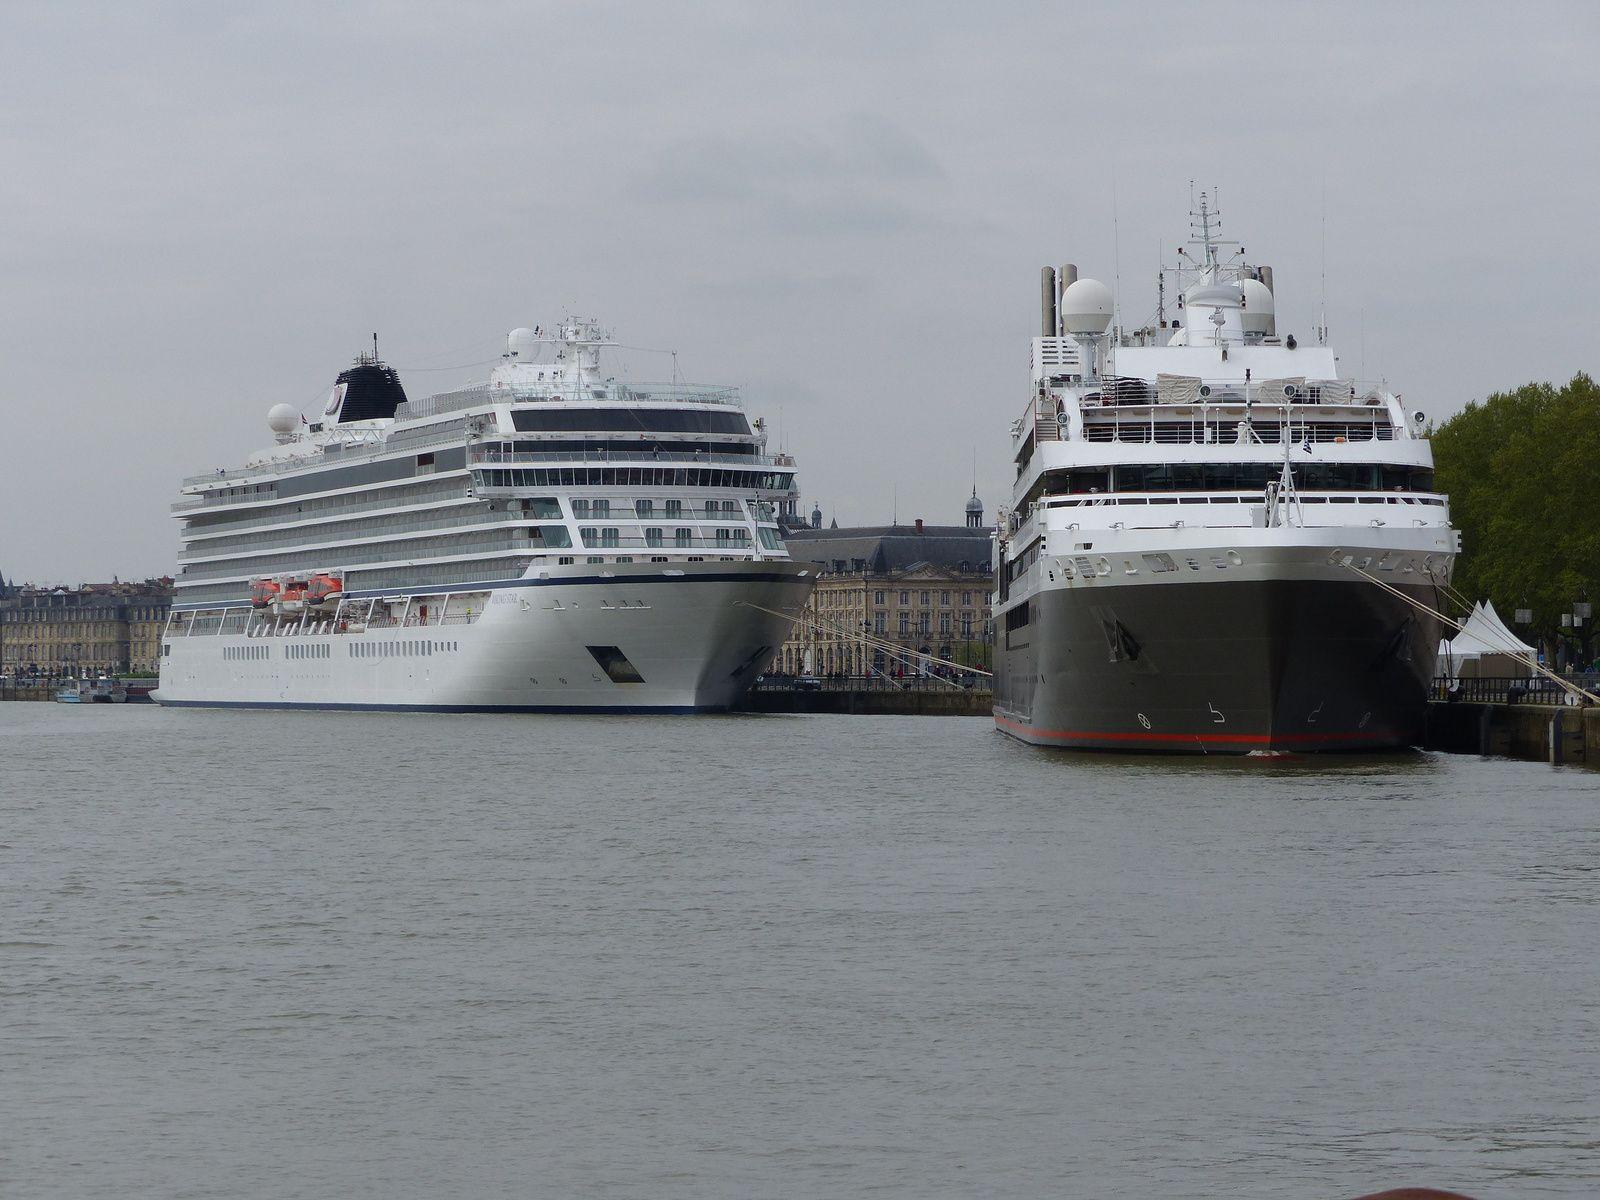 The high season of cruises begins in Bordeaux